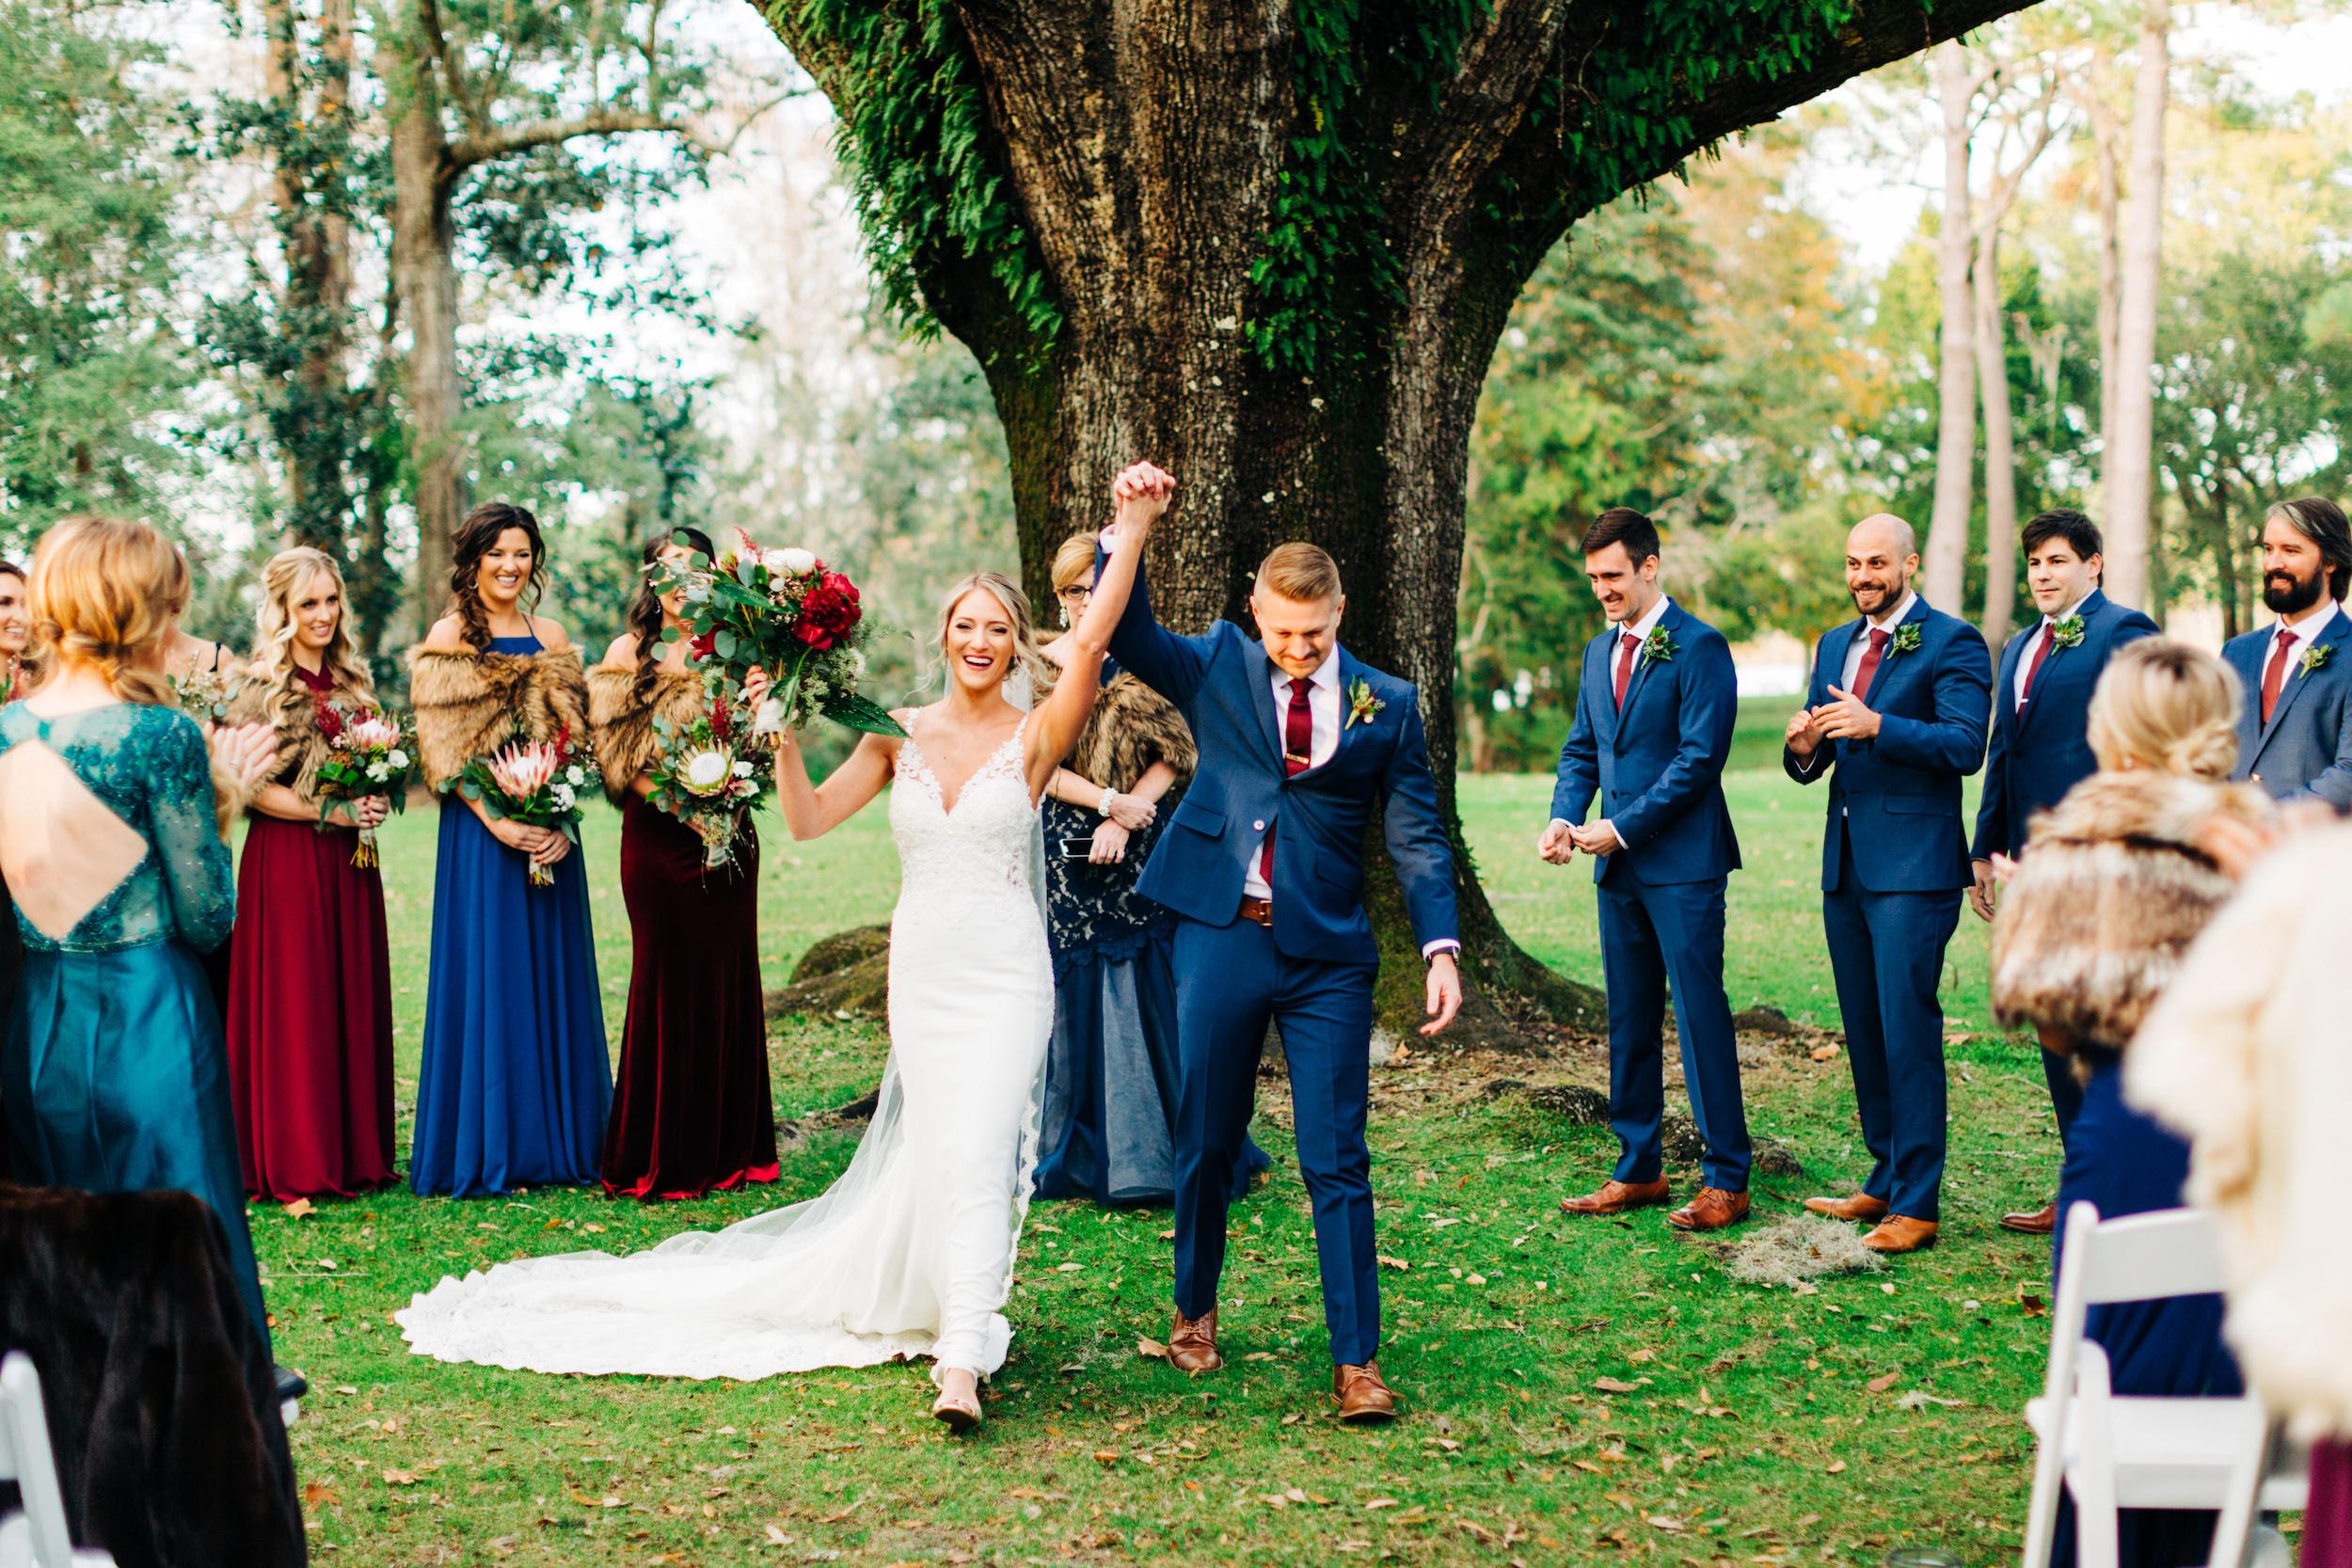 Ricky & Brittney - Ceremony - Jake & Katie Photography_161.jpg